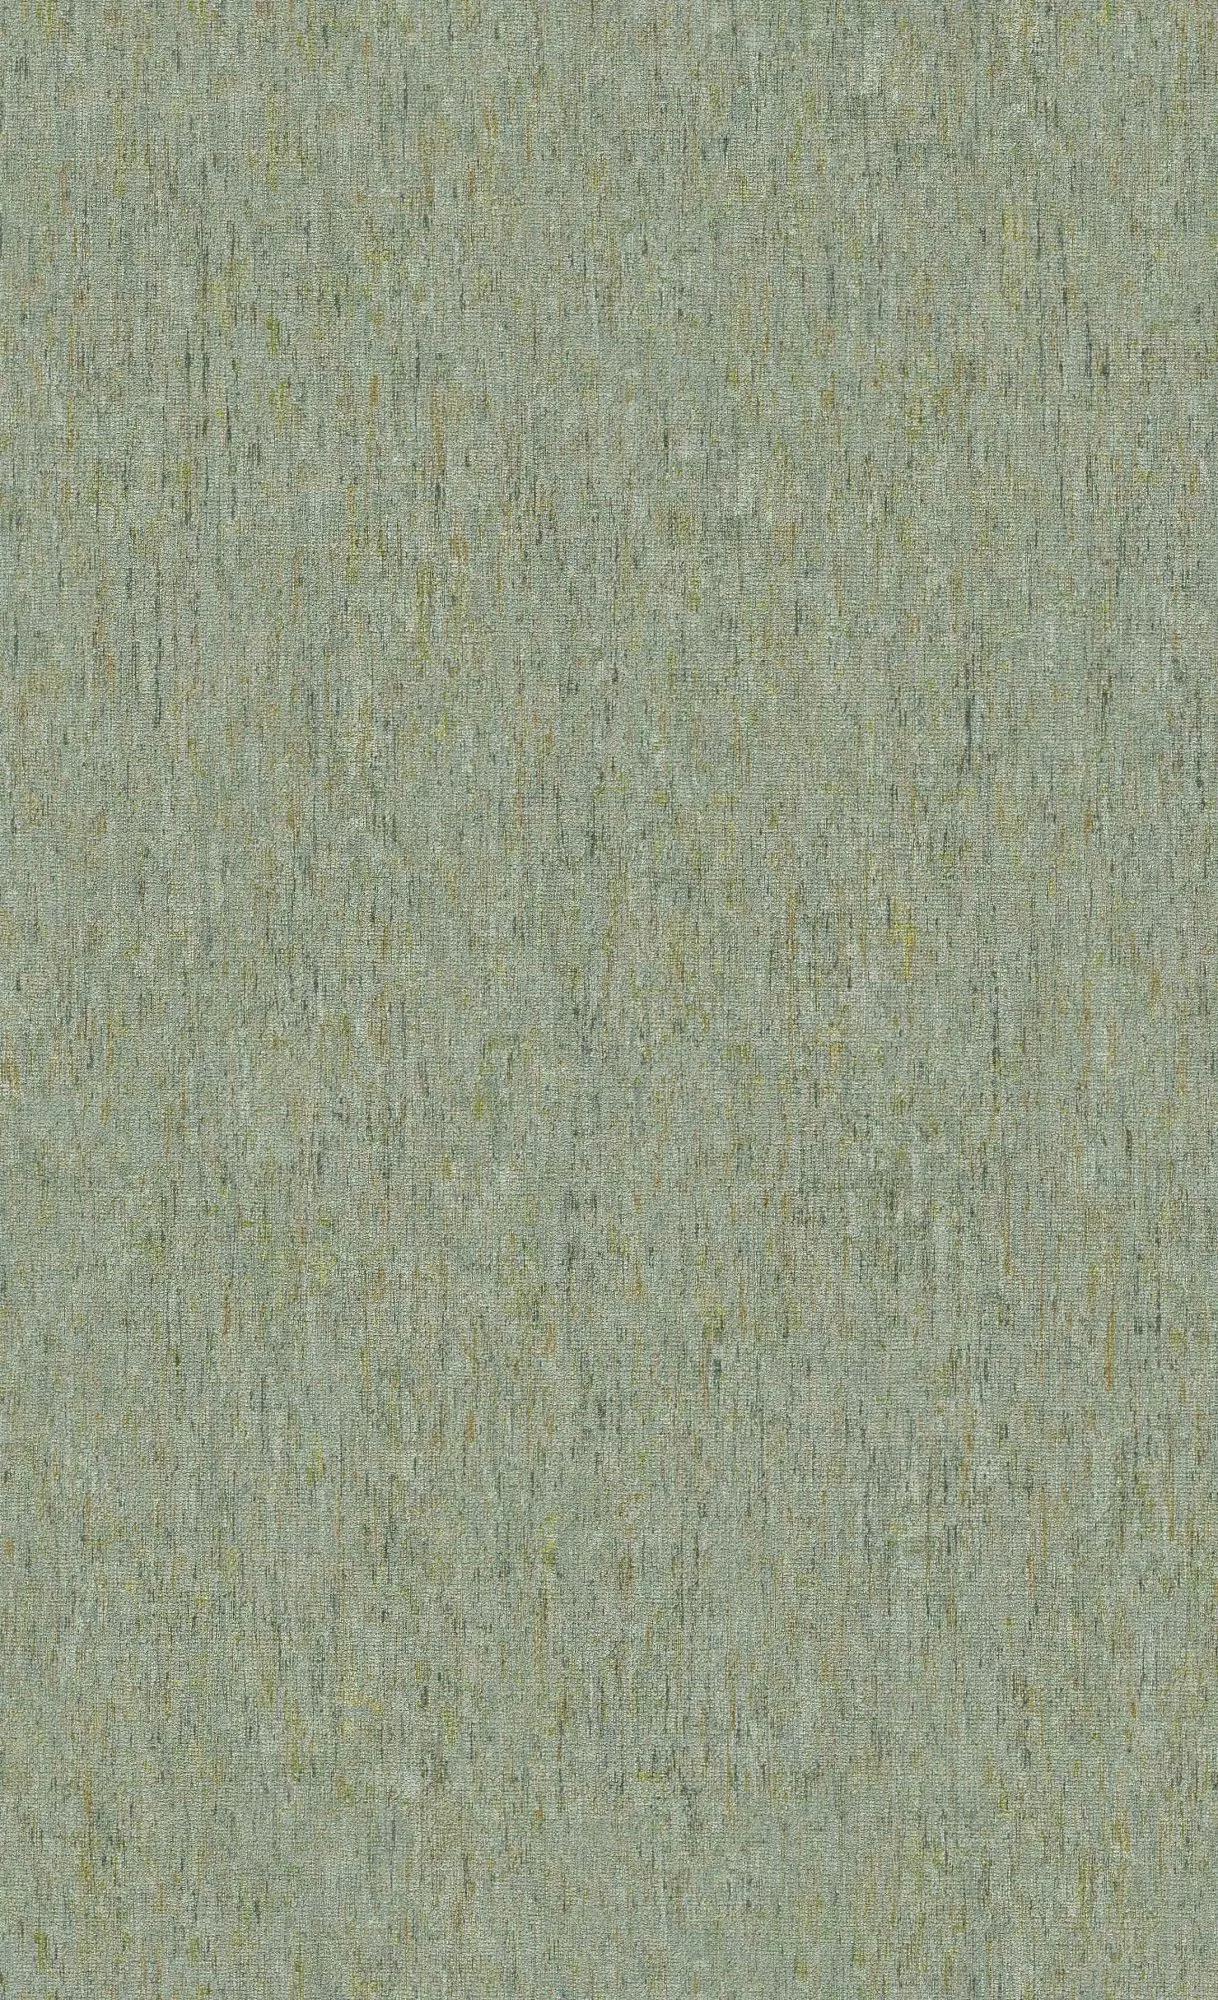 Zöld alapon foltos hatású tapéta